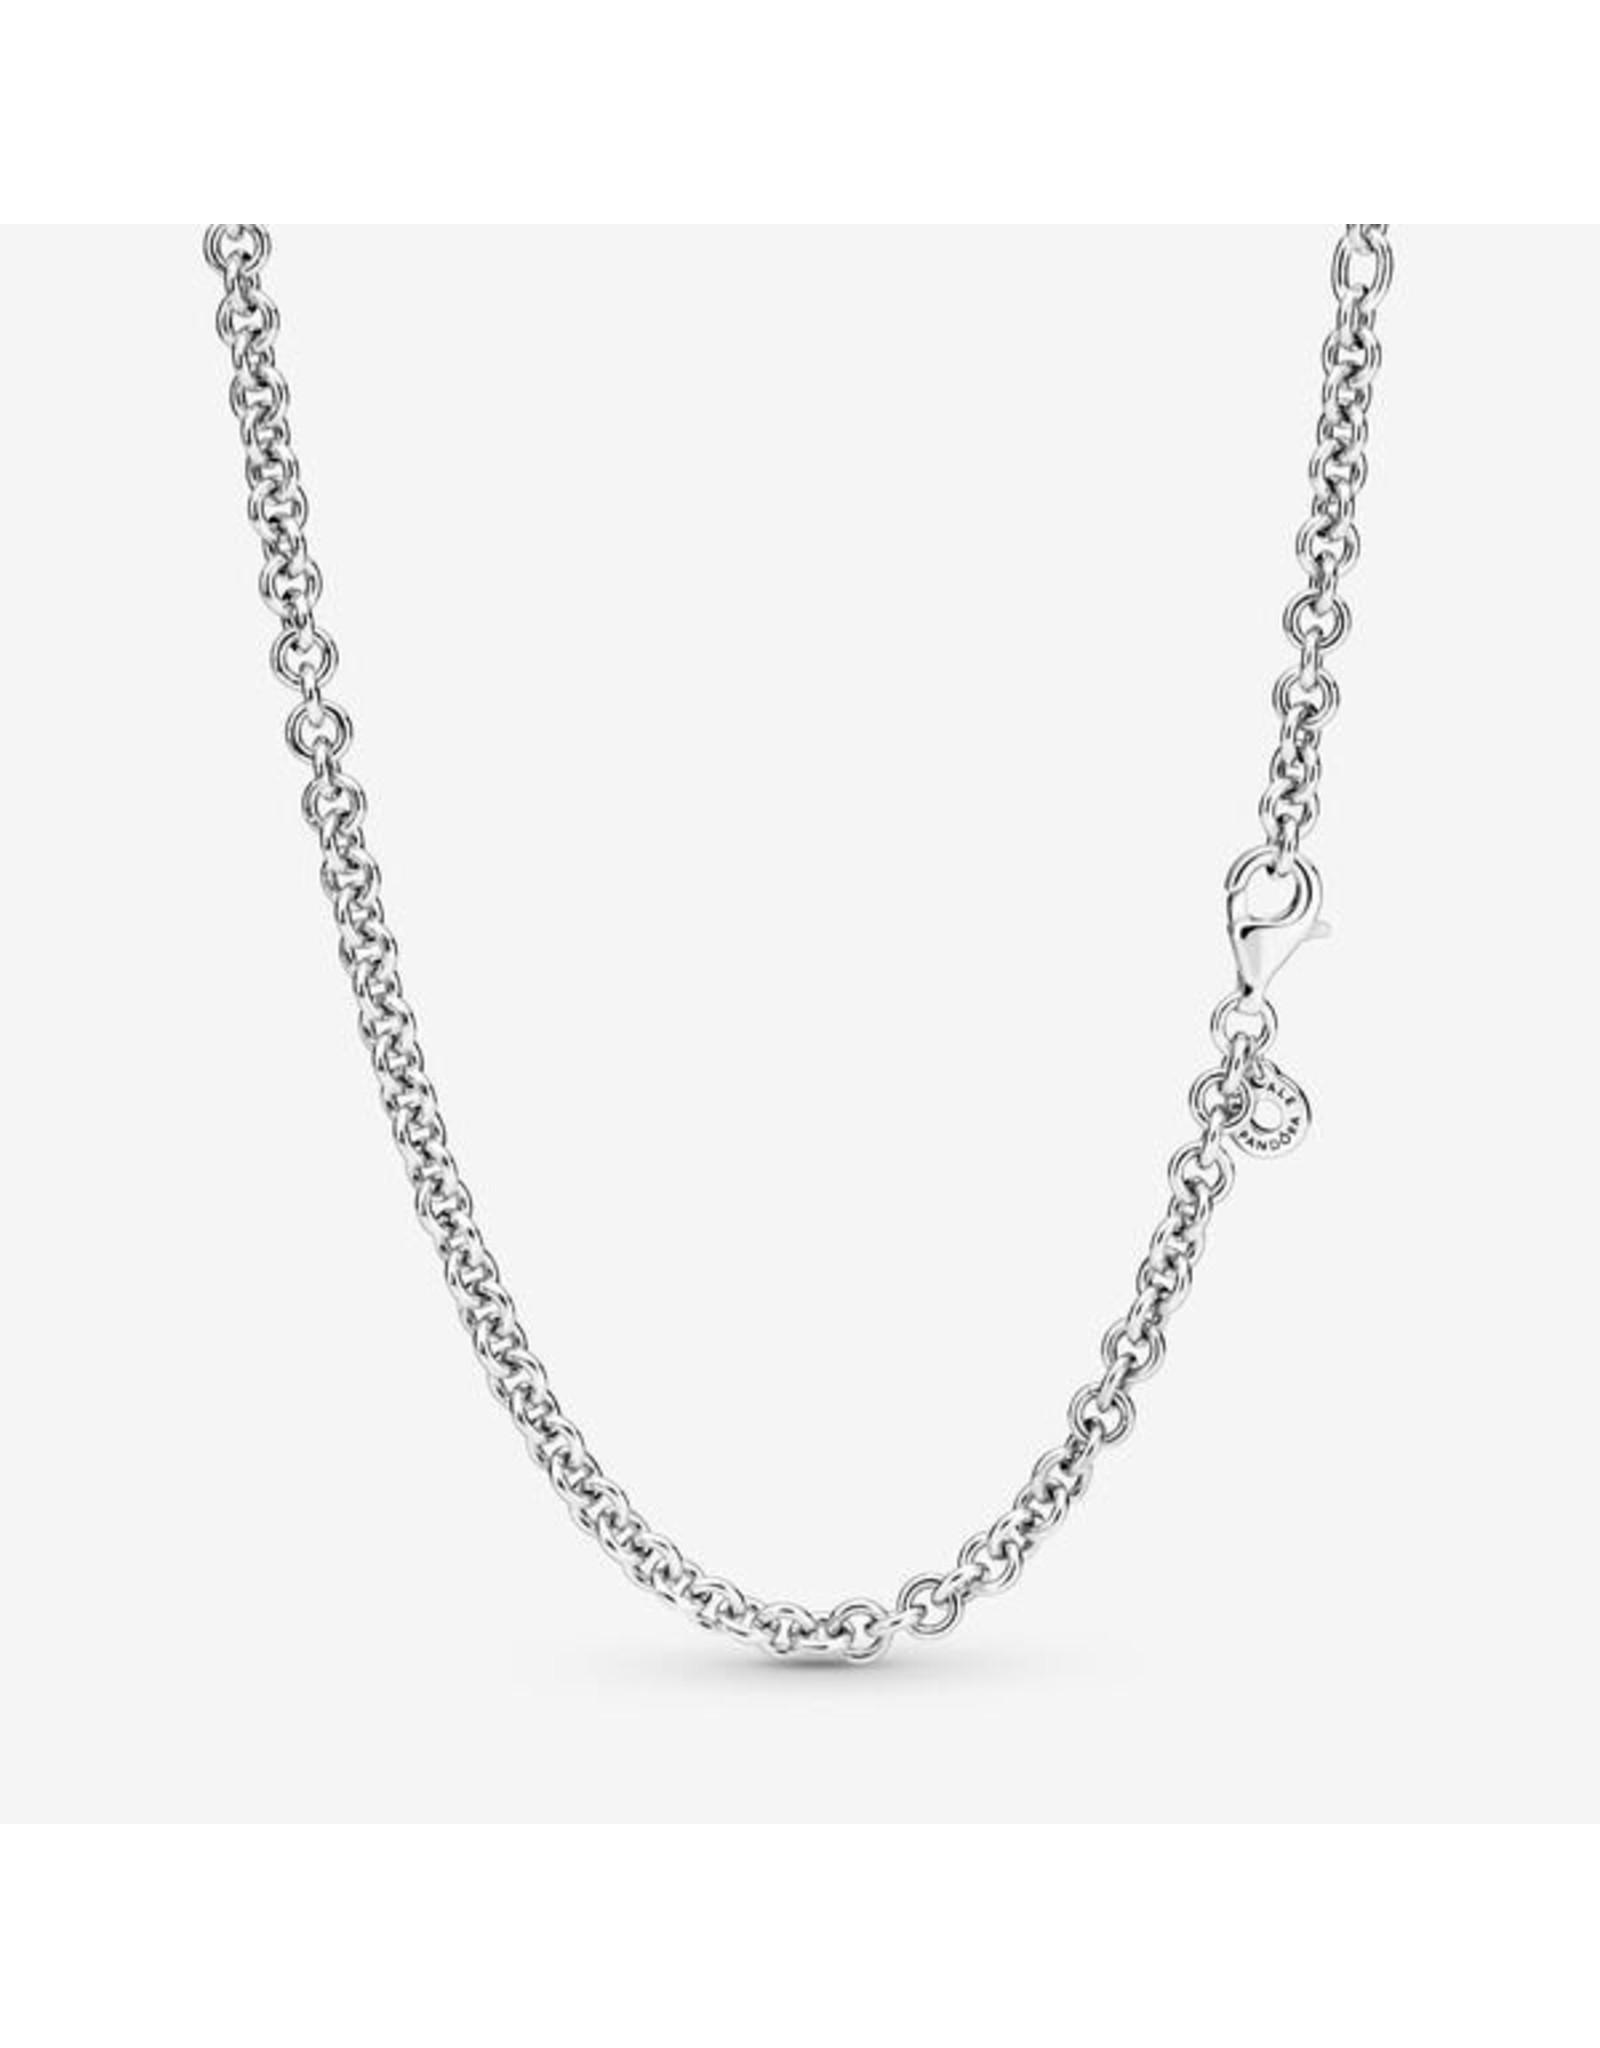 Pandora Pandora Necklace,399564C00, Thick Cable Chain